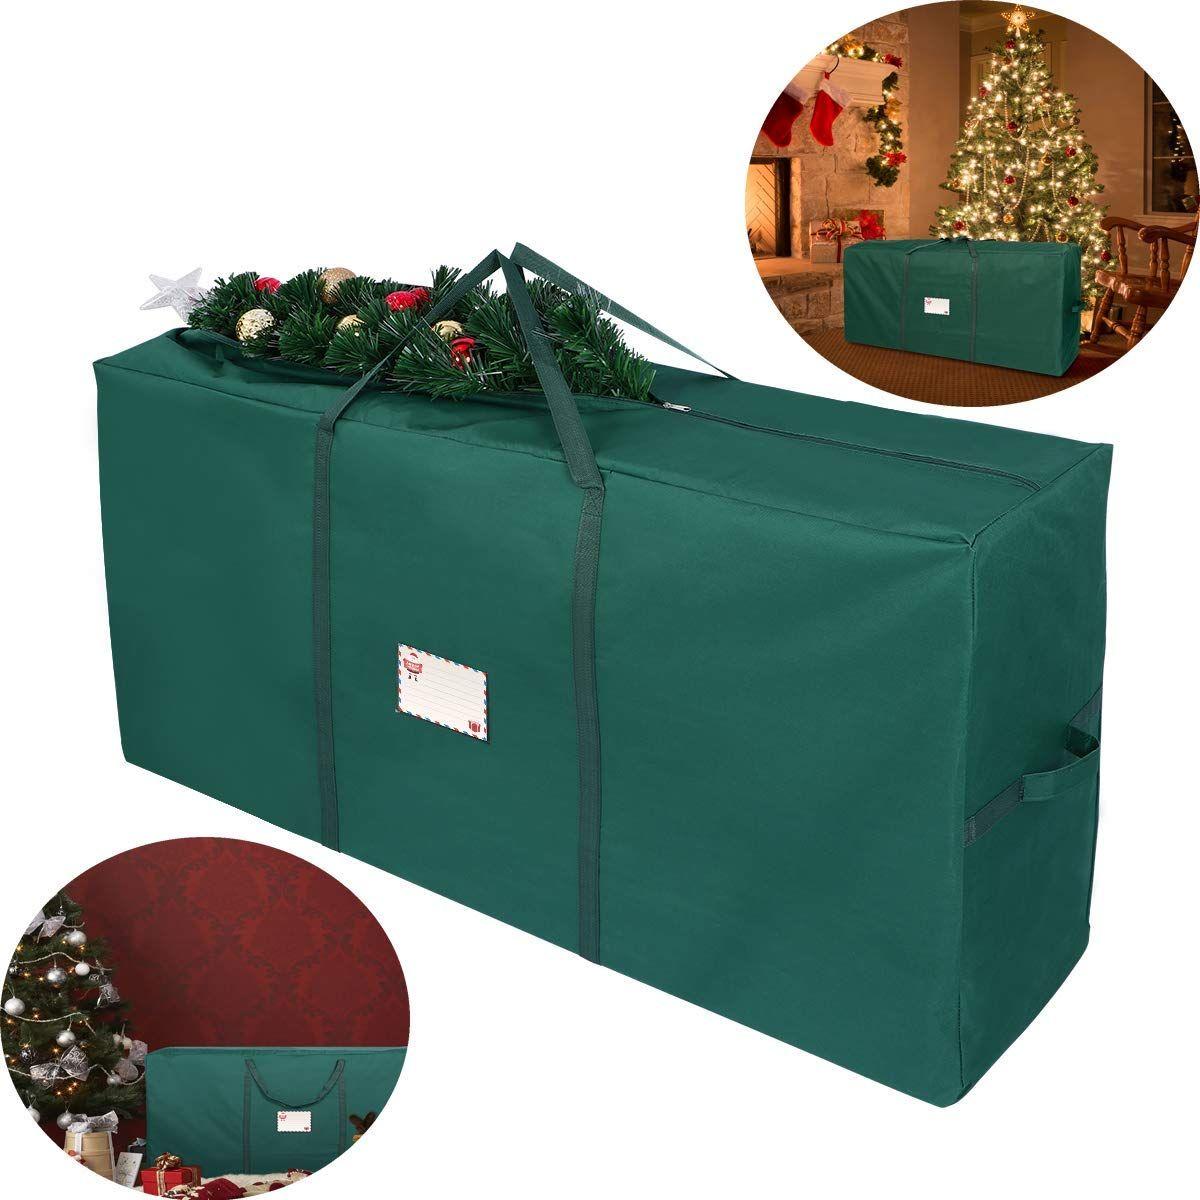 Amazon Com Unomor Christmas Tree Storage Bag Fit Up To 7 Christmas Tree Container Artifici Tree Storage Bag Christmas Tree Storage Bag Christmas Tree Storage